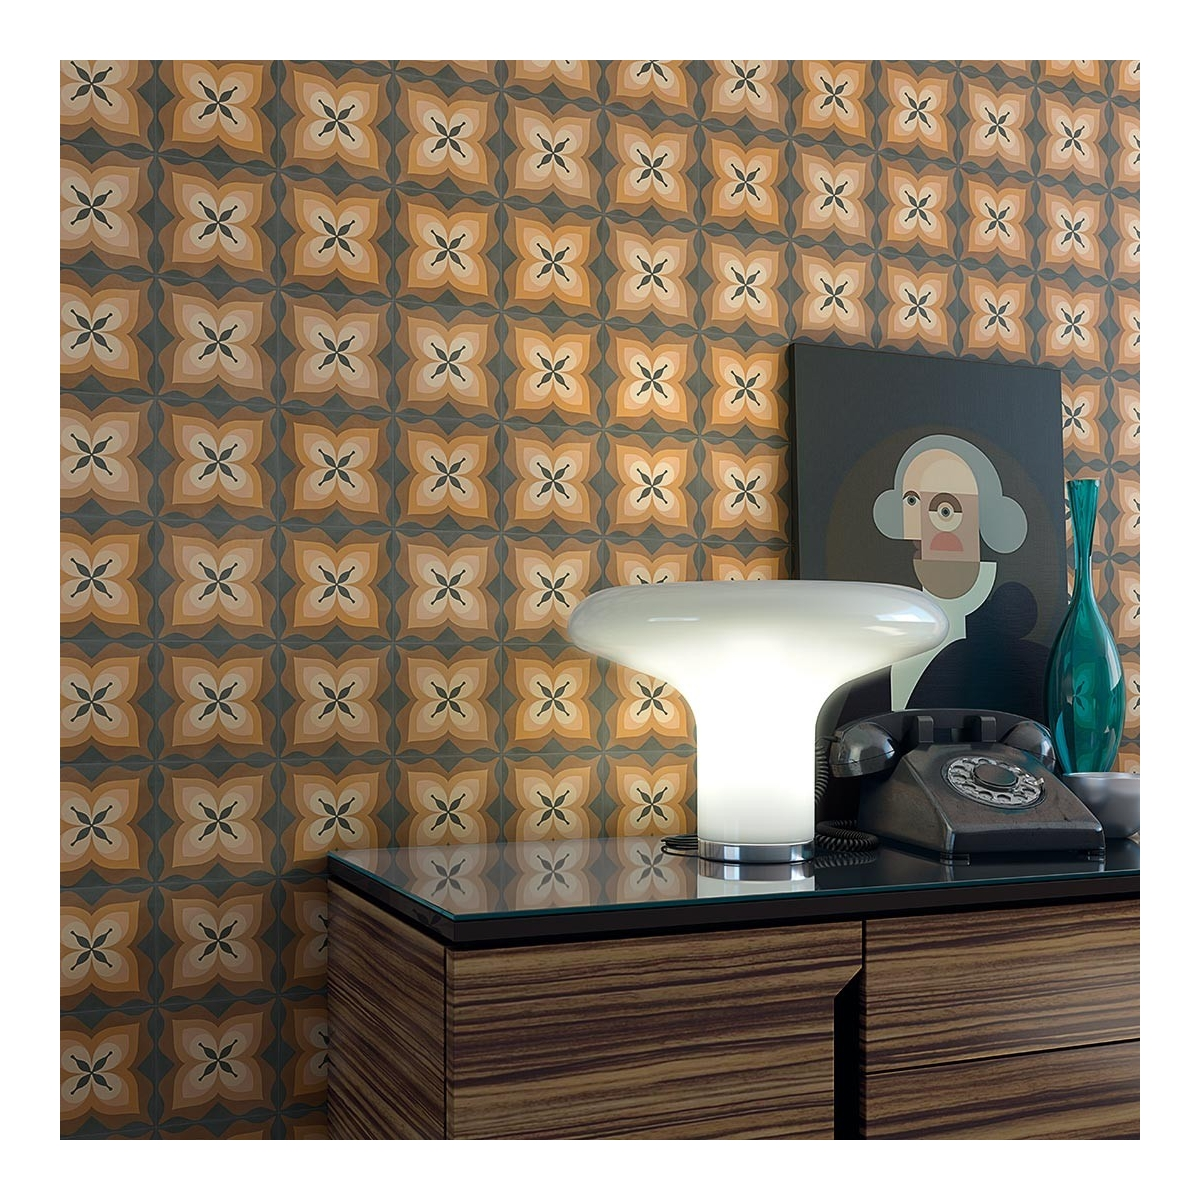 Bethel 15x15 (m2) - Colección Pop Tile de Vives - Marca Vives